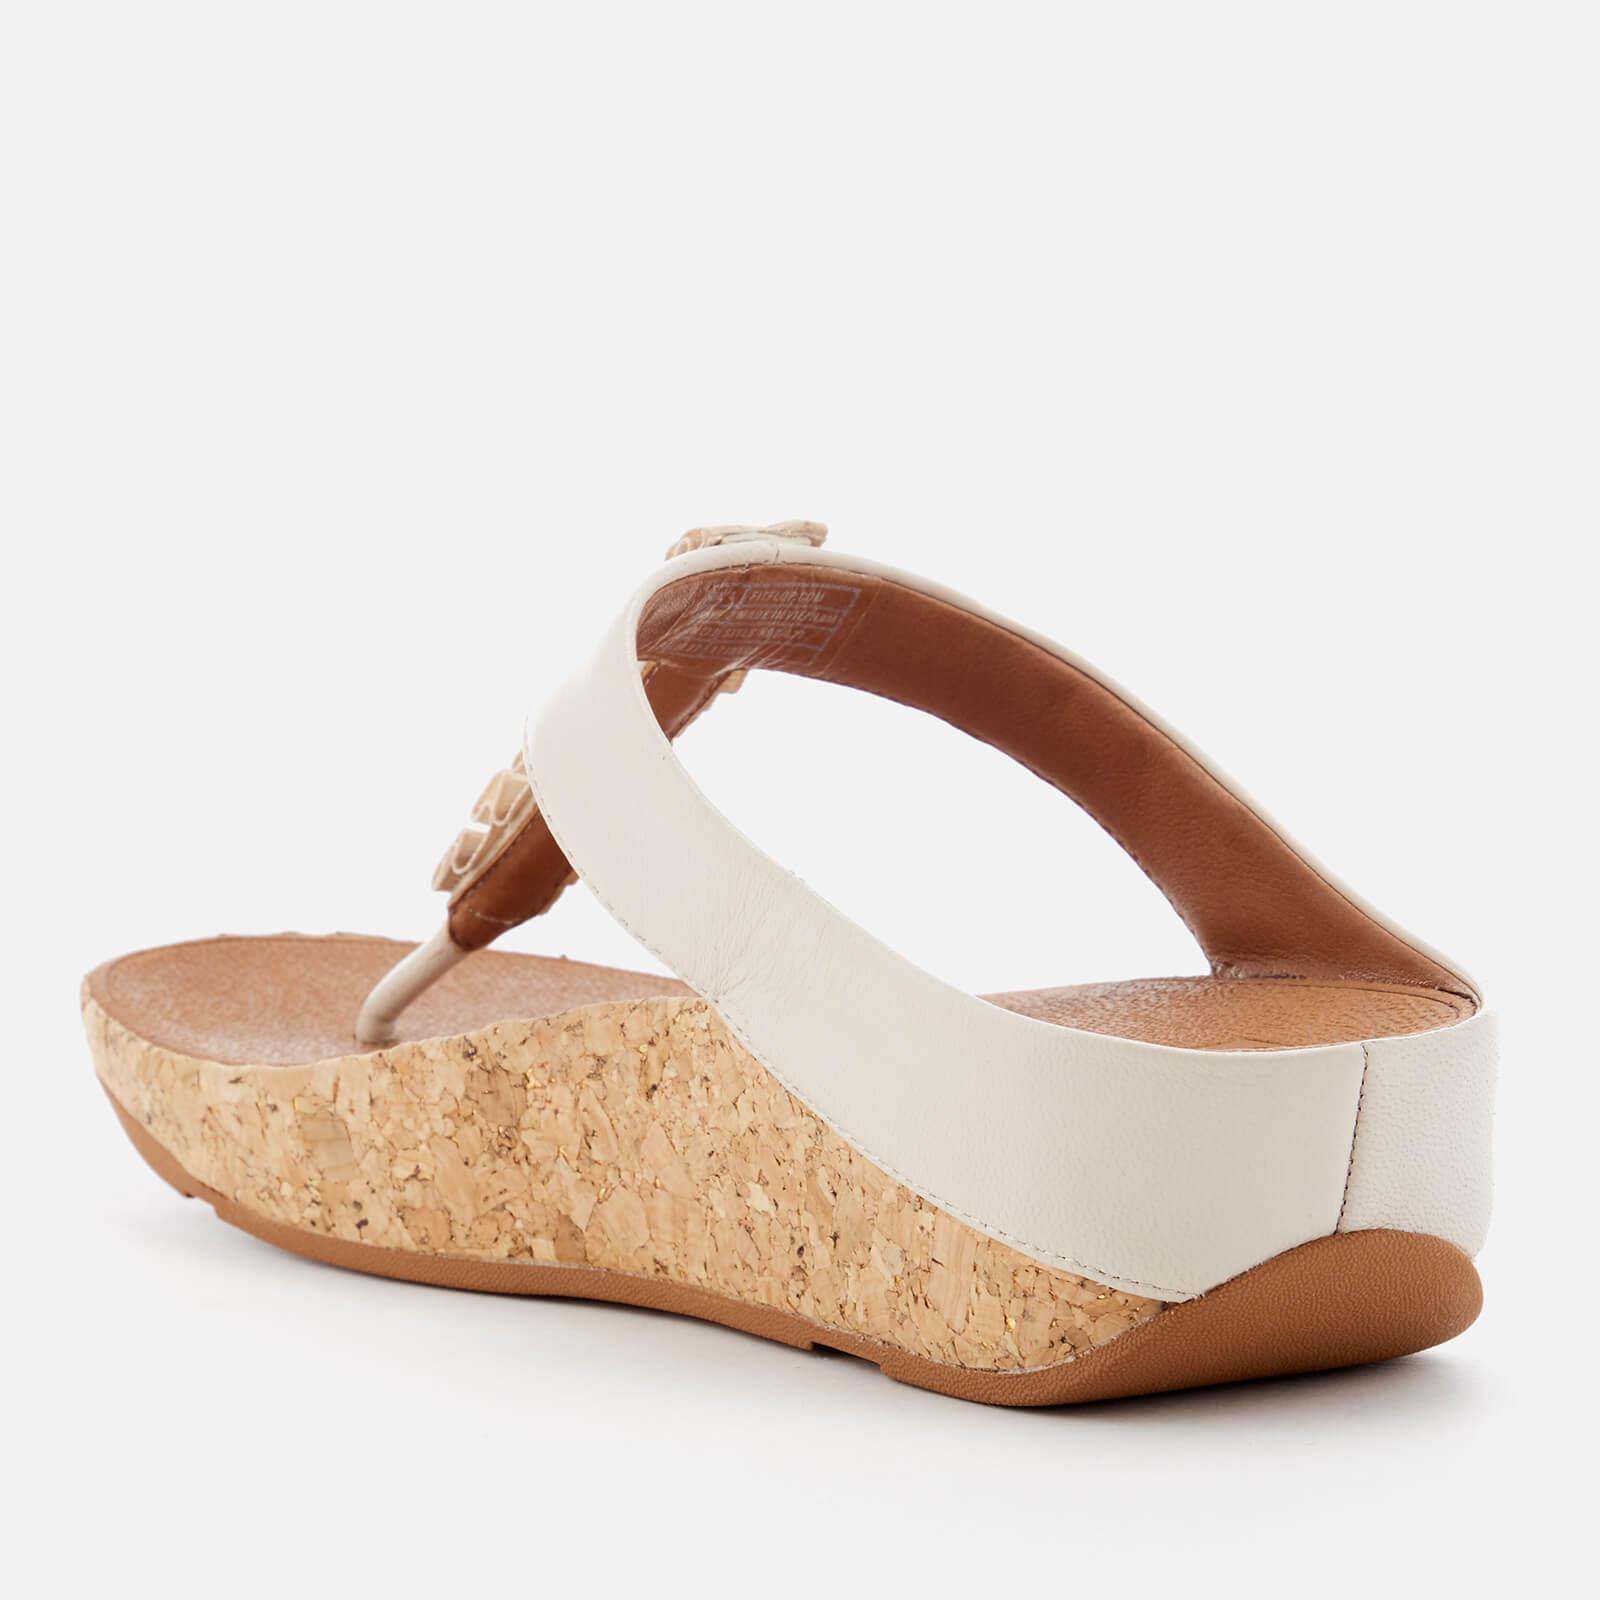 a9094f803dc7dd ... Fitflop - White Ruffle Toe Post Sandals - Lyst. View fullscreen cozy  fresh d8f16 60474 ...